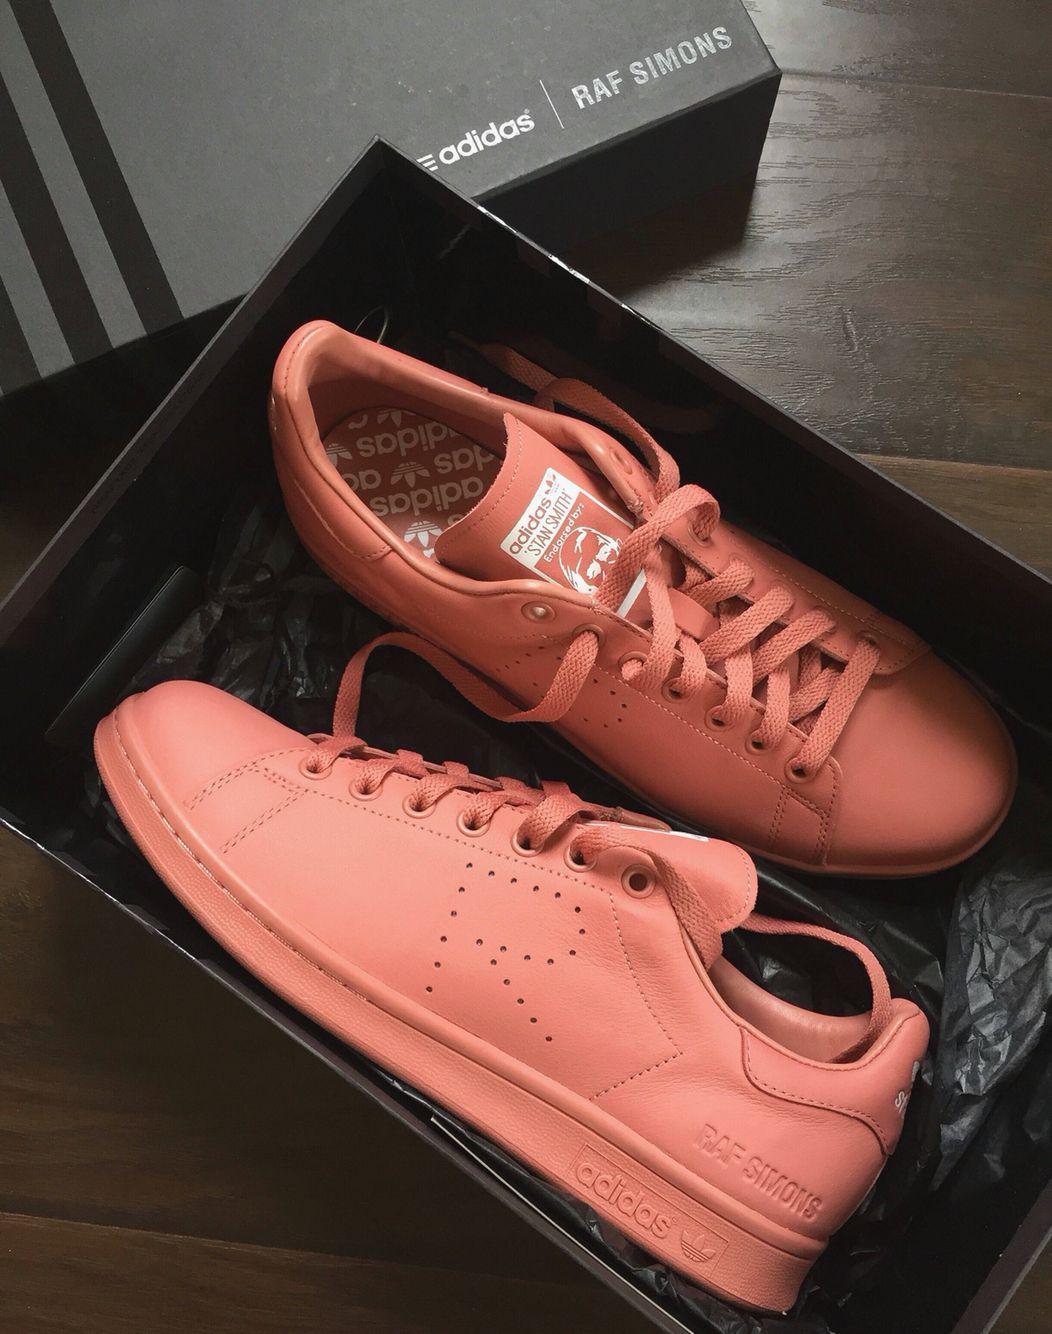 Raf Simons For Women Fw20 Collection Skate Wear Minimalist Sneakers Adidas Stan Smith